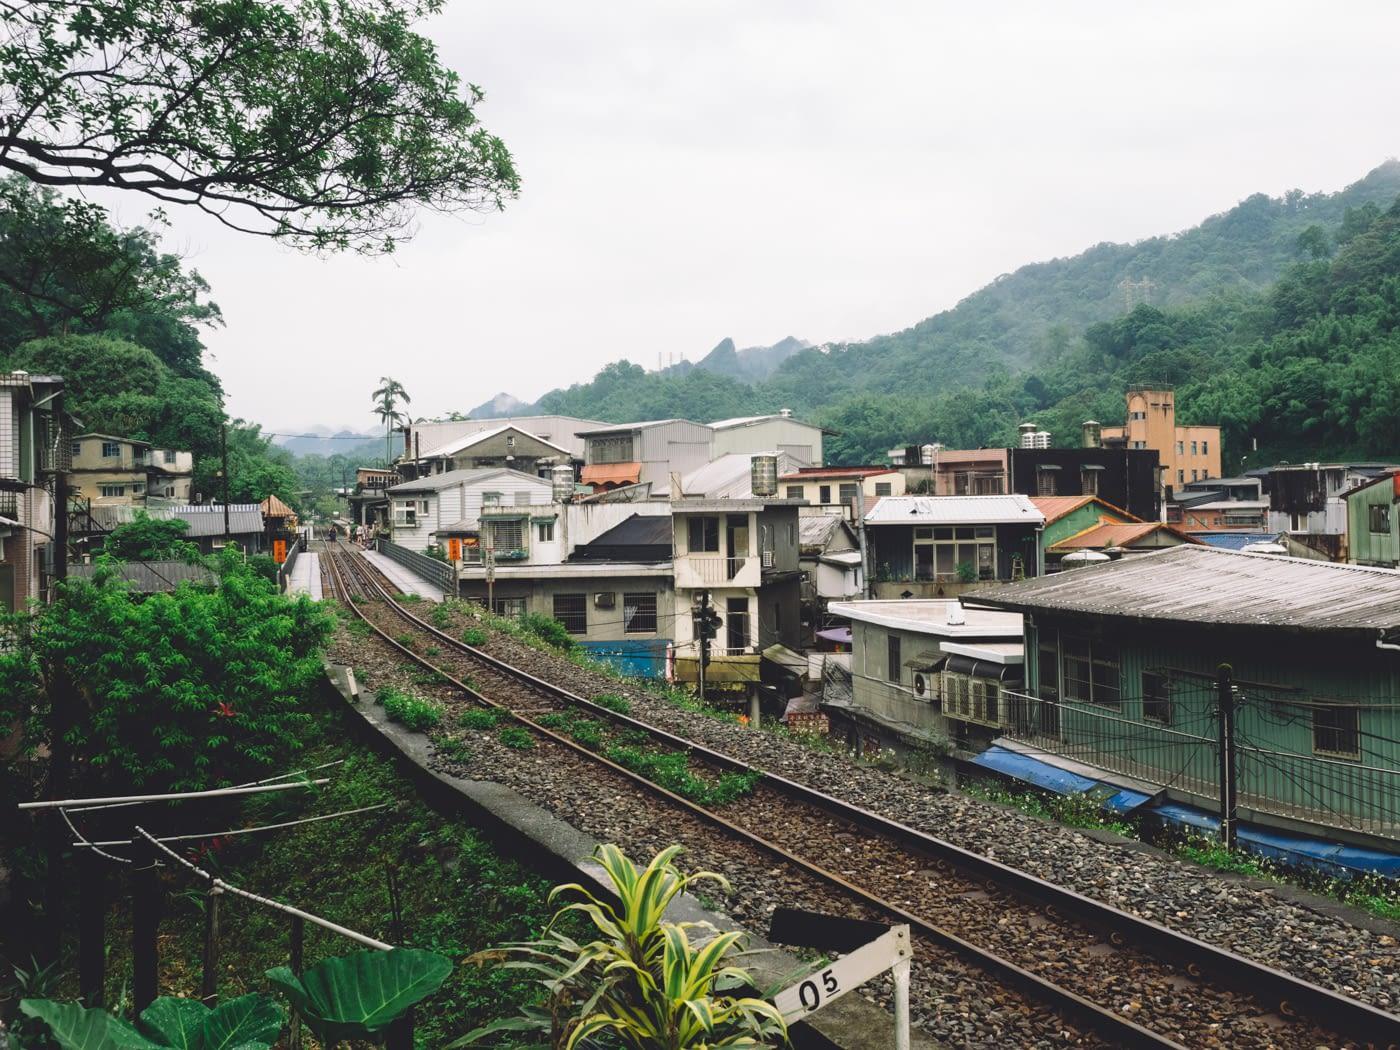 Taiwan - Shifen - Railway track